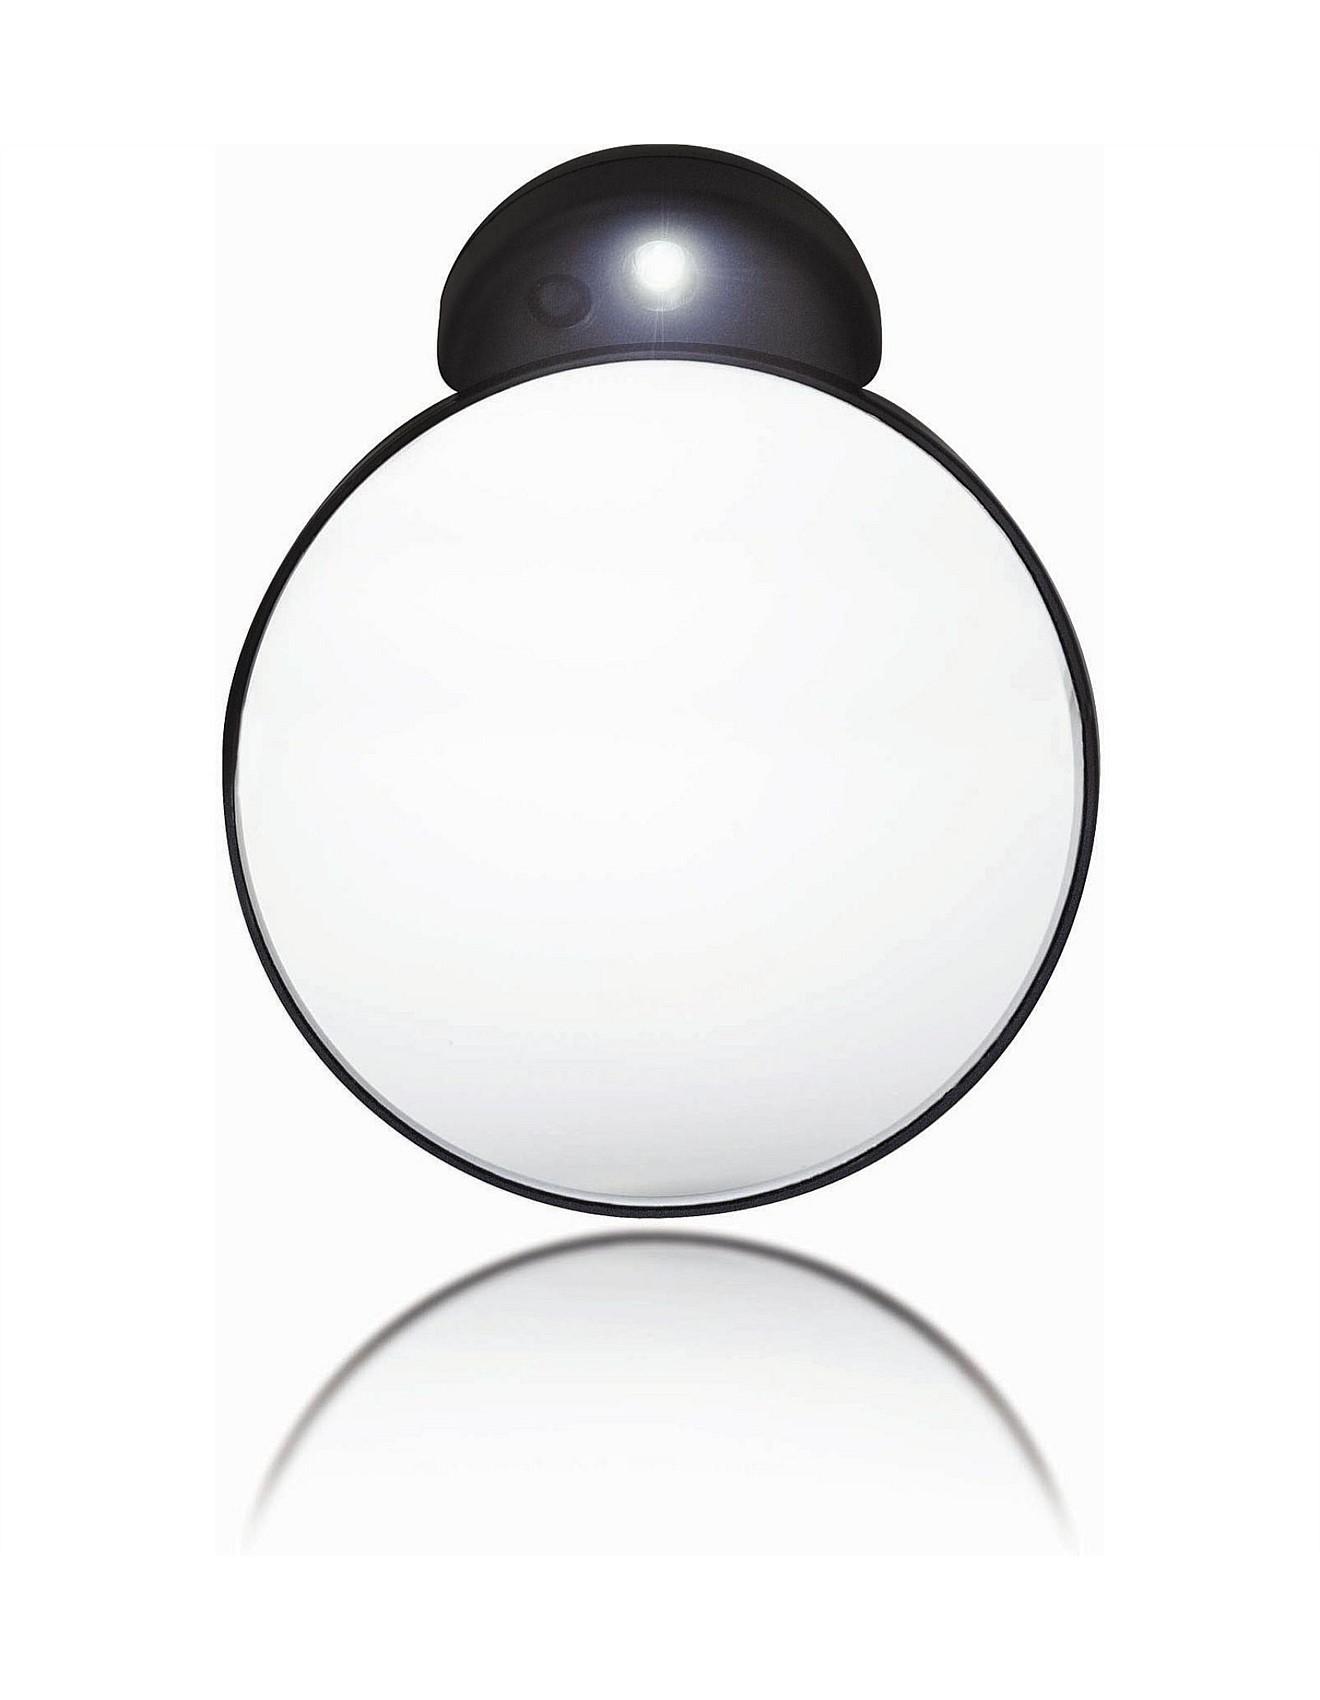 Tweezermate 10 X Lighted Mirror